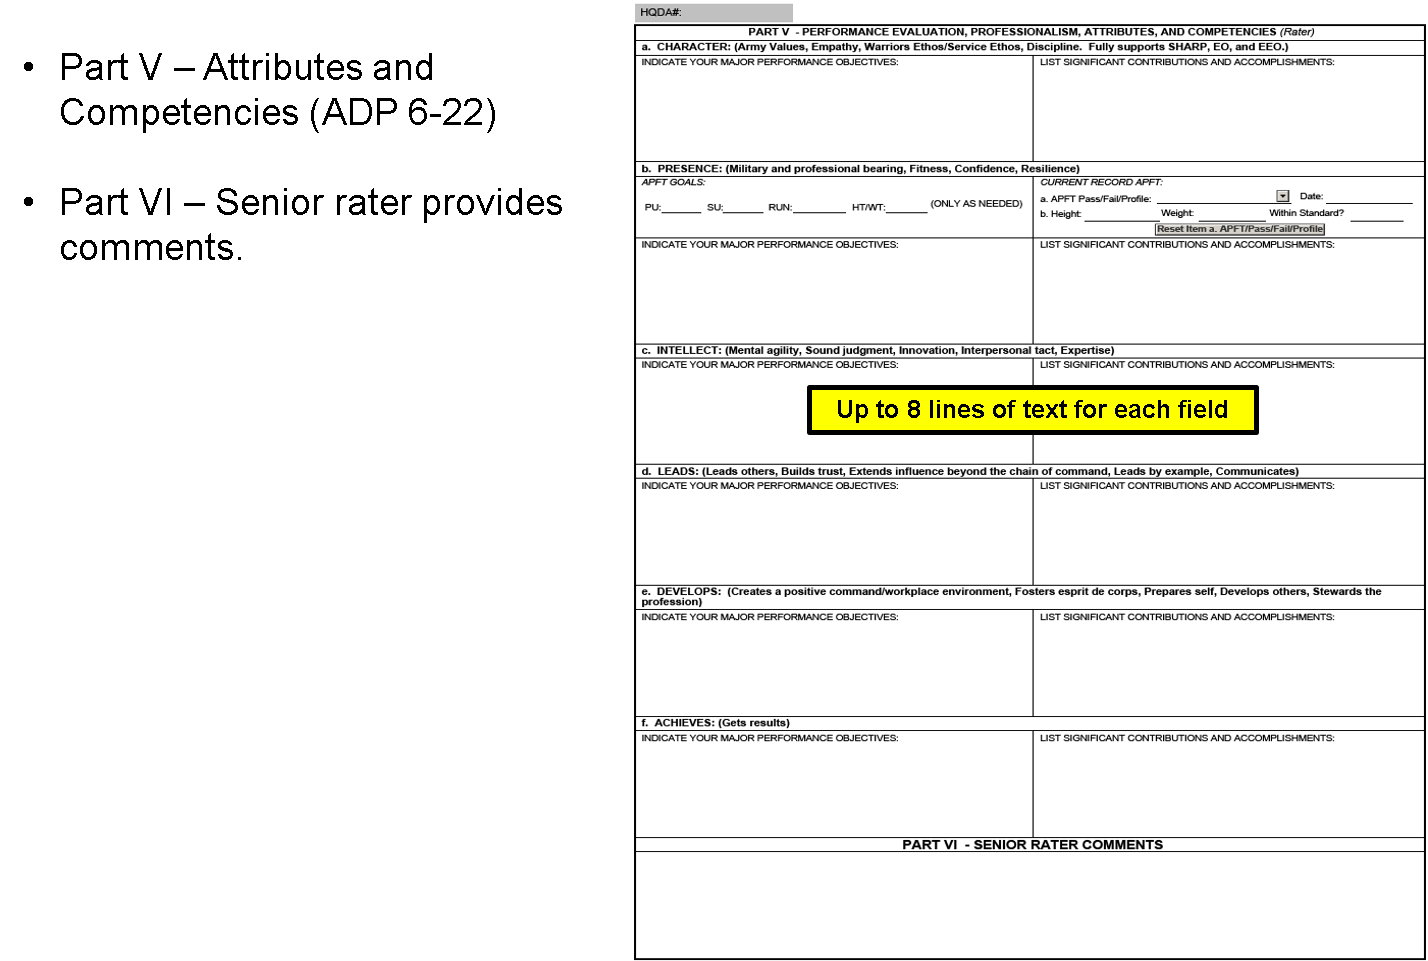 New NCOER Support Form DA 2166-9 Series